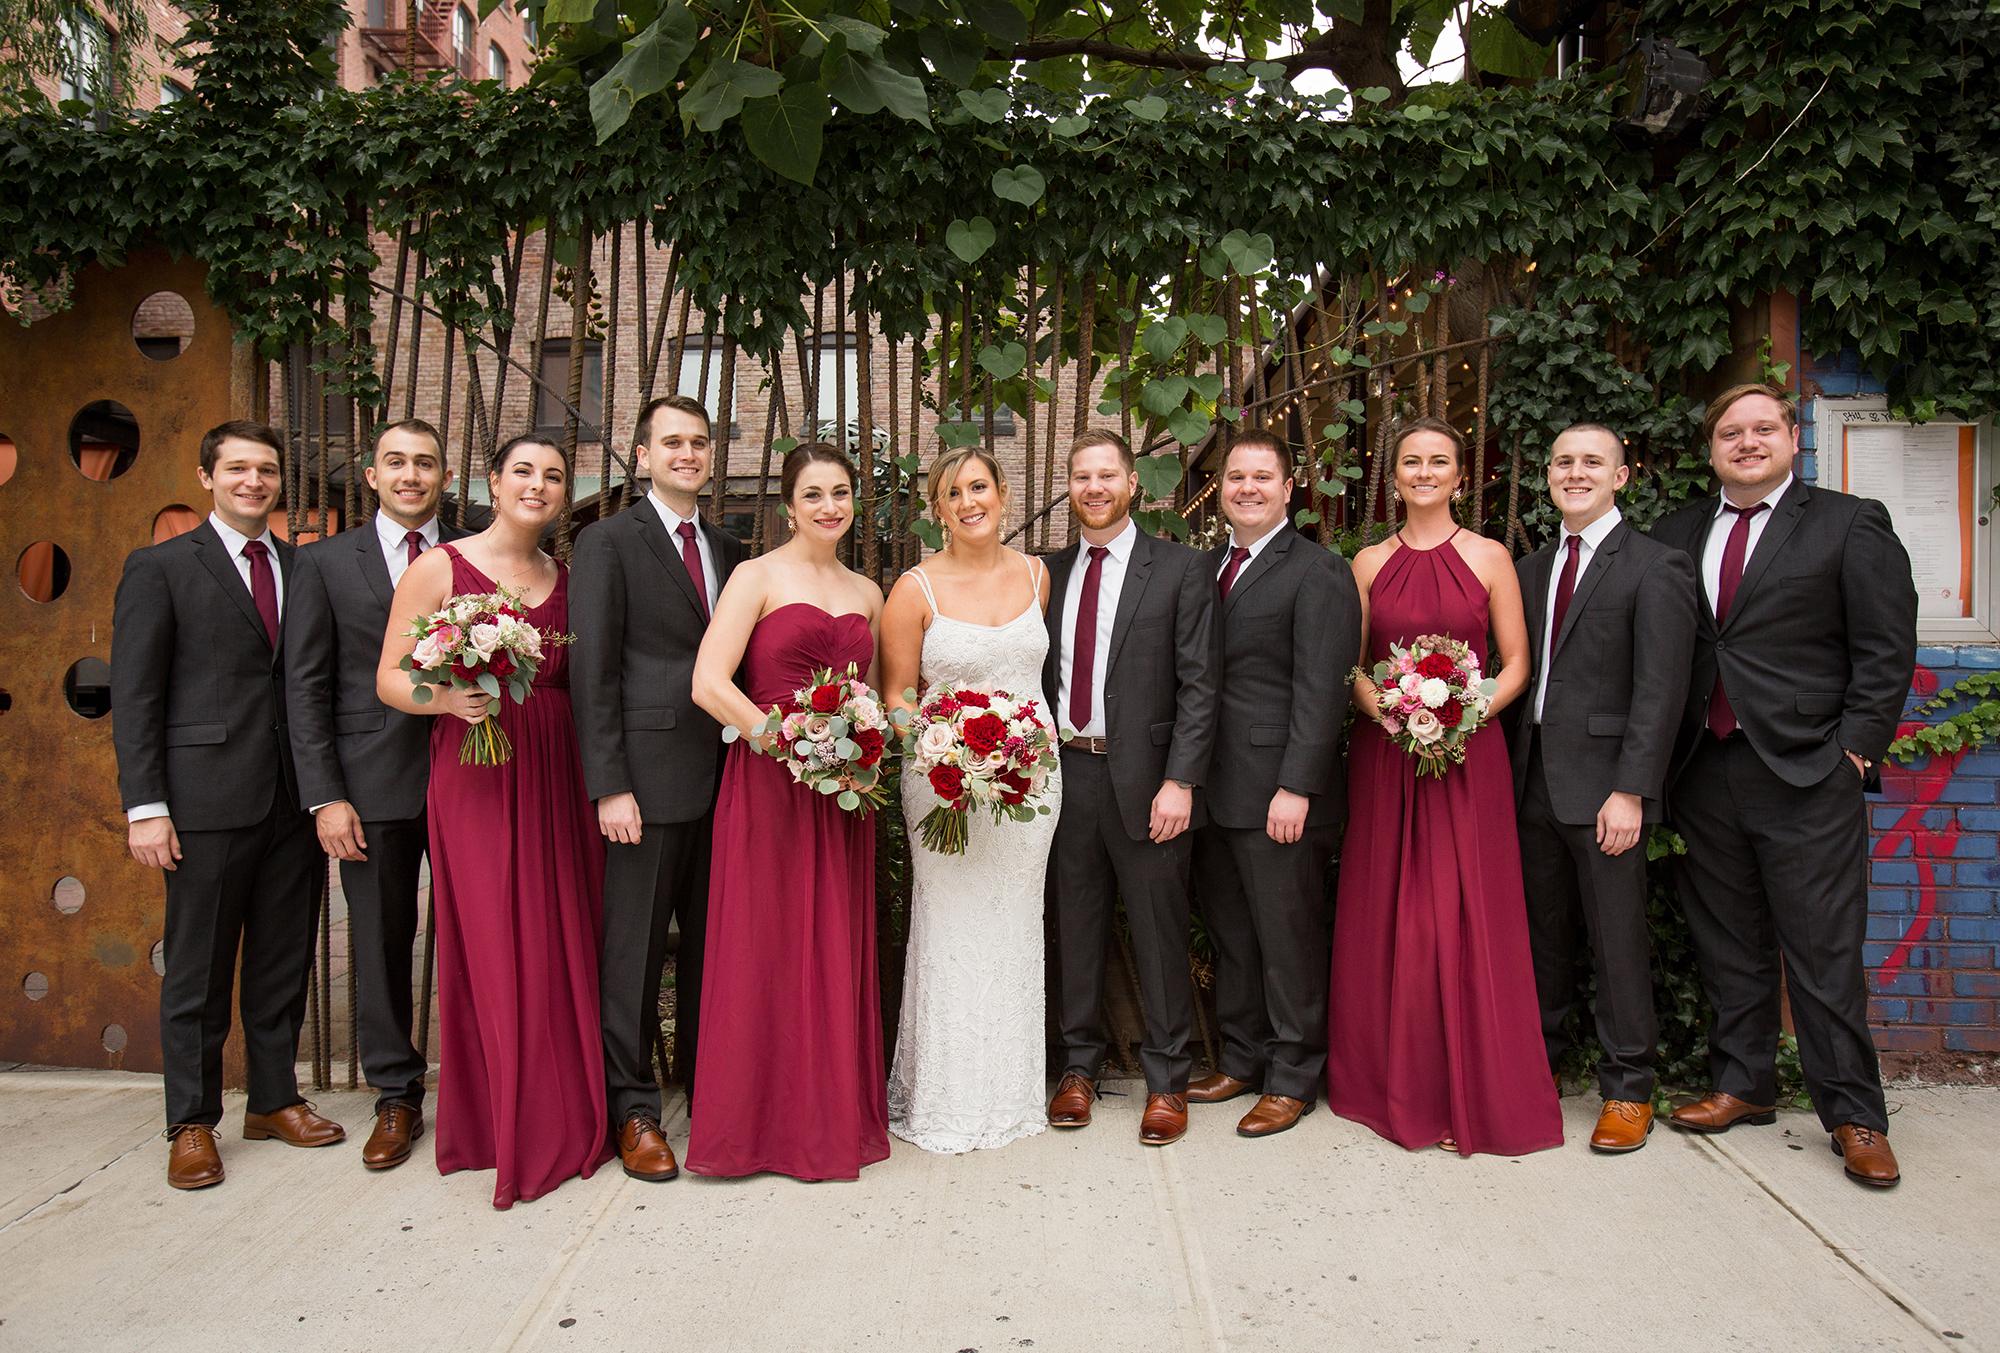 Julep-Belle-Wedding-Photography-Los-Angeles-Grace-Jake-07.jpg